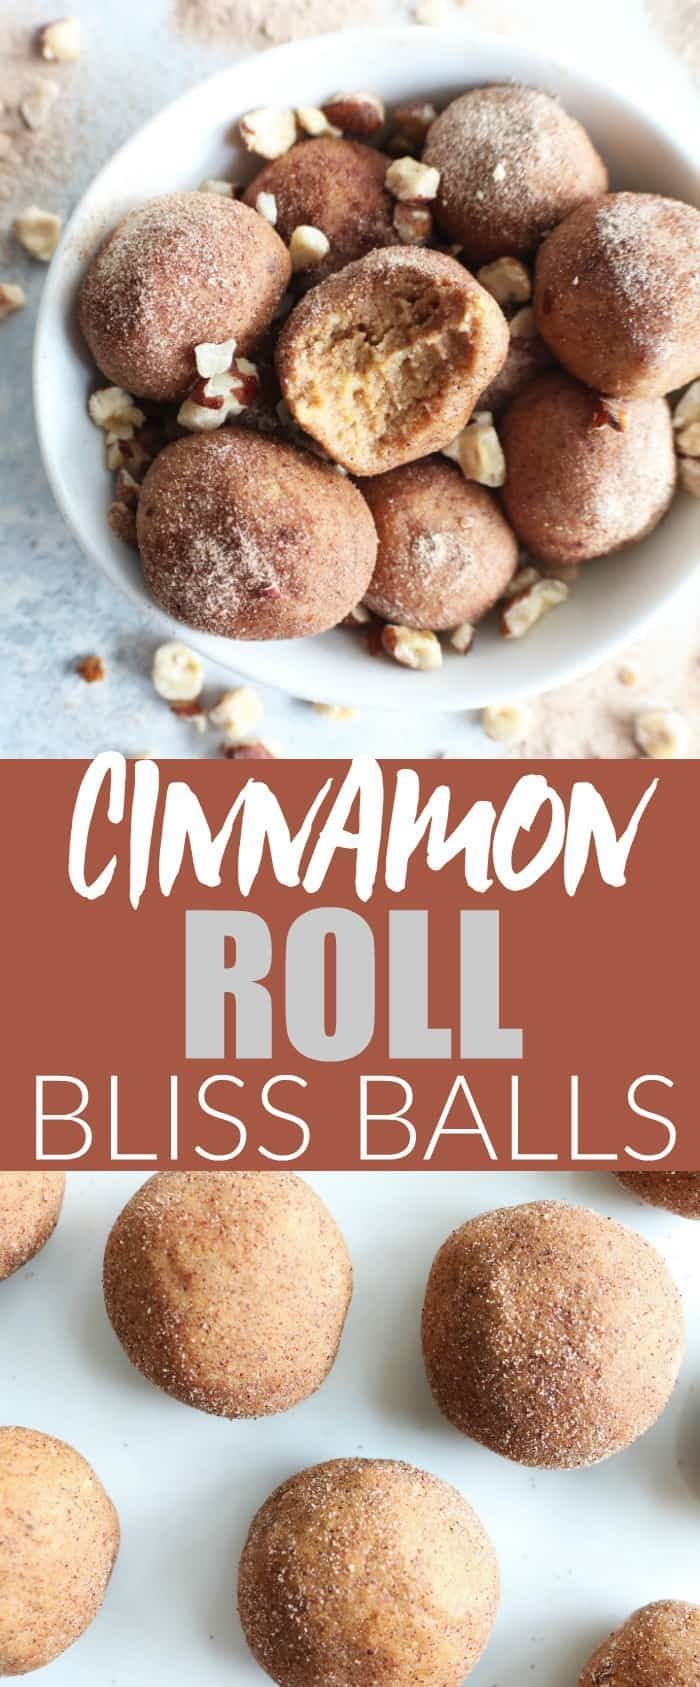 Cinnamon Roll Bliss Balls